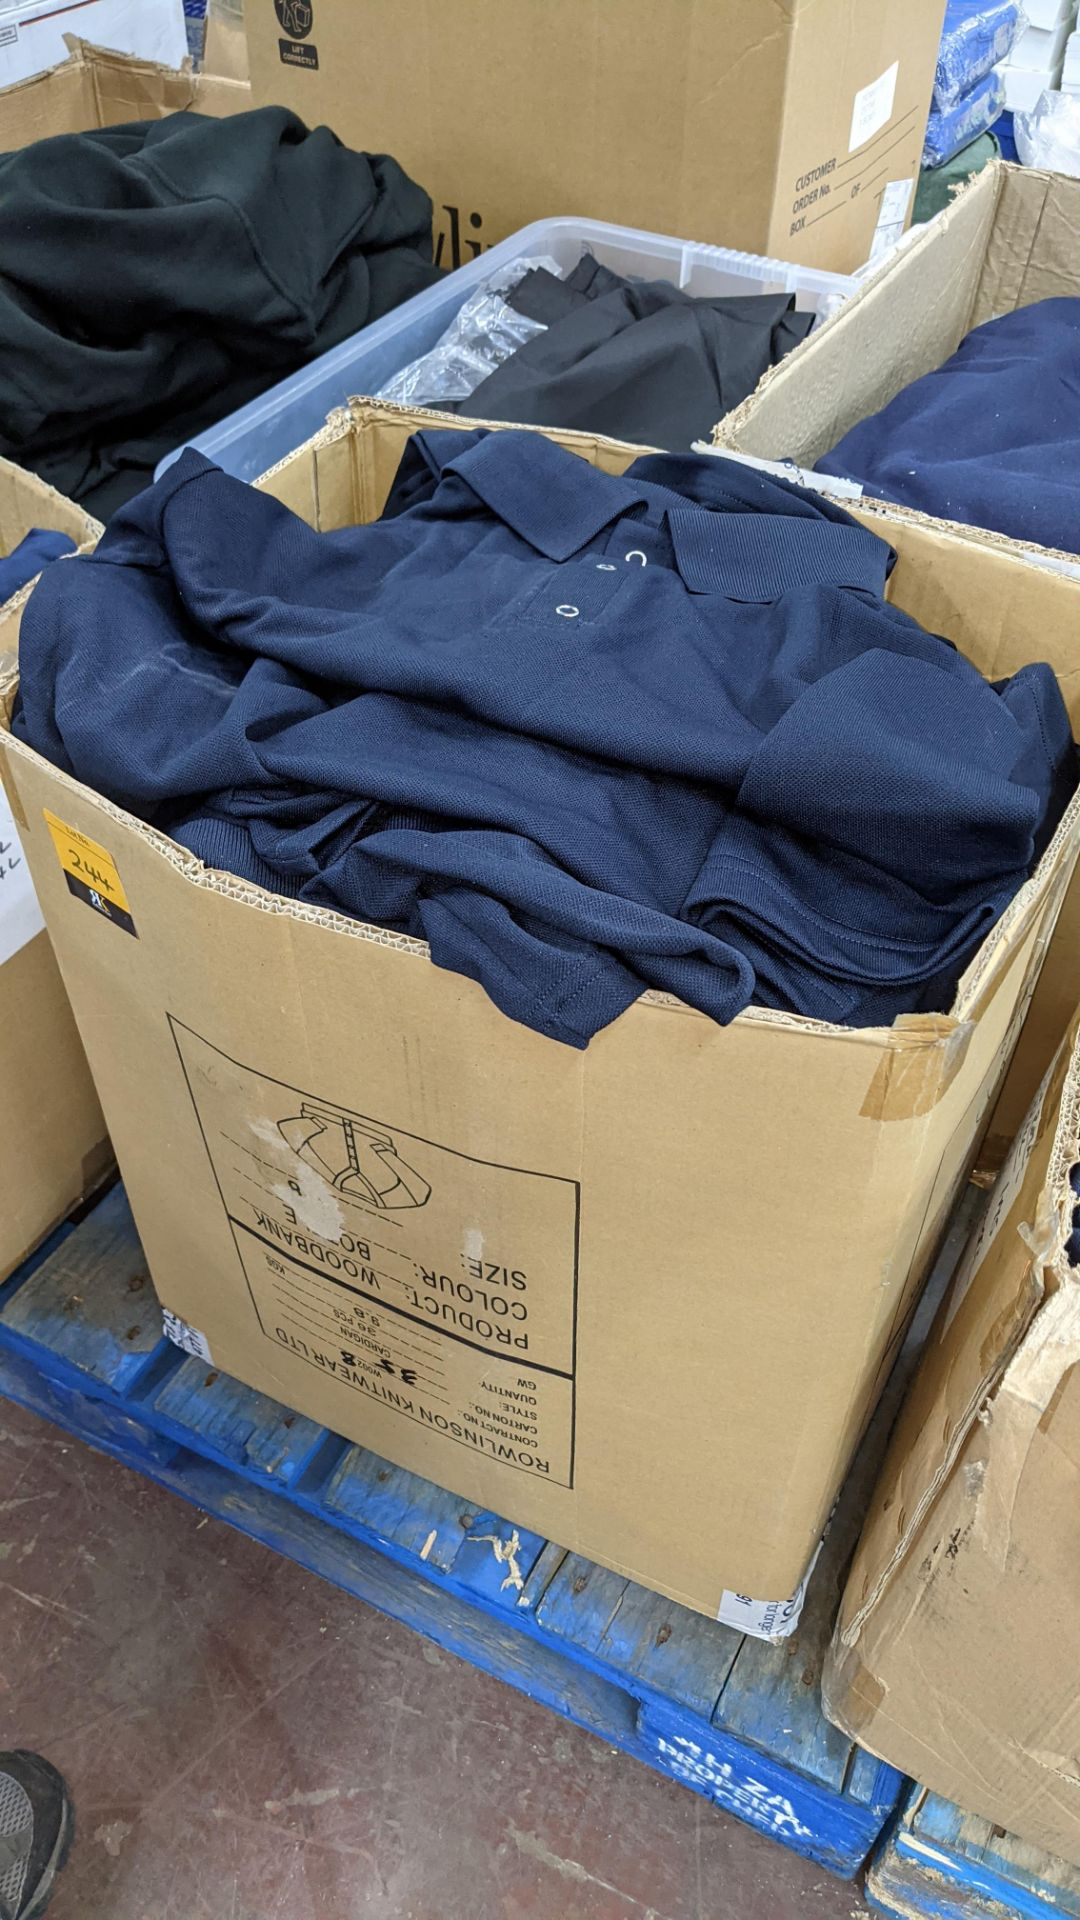 Large quantity of blue polo shirts - 1 box - Image 4 of 4